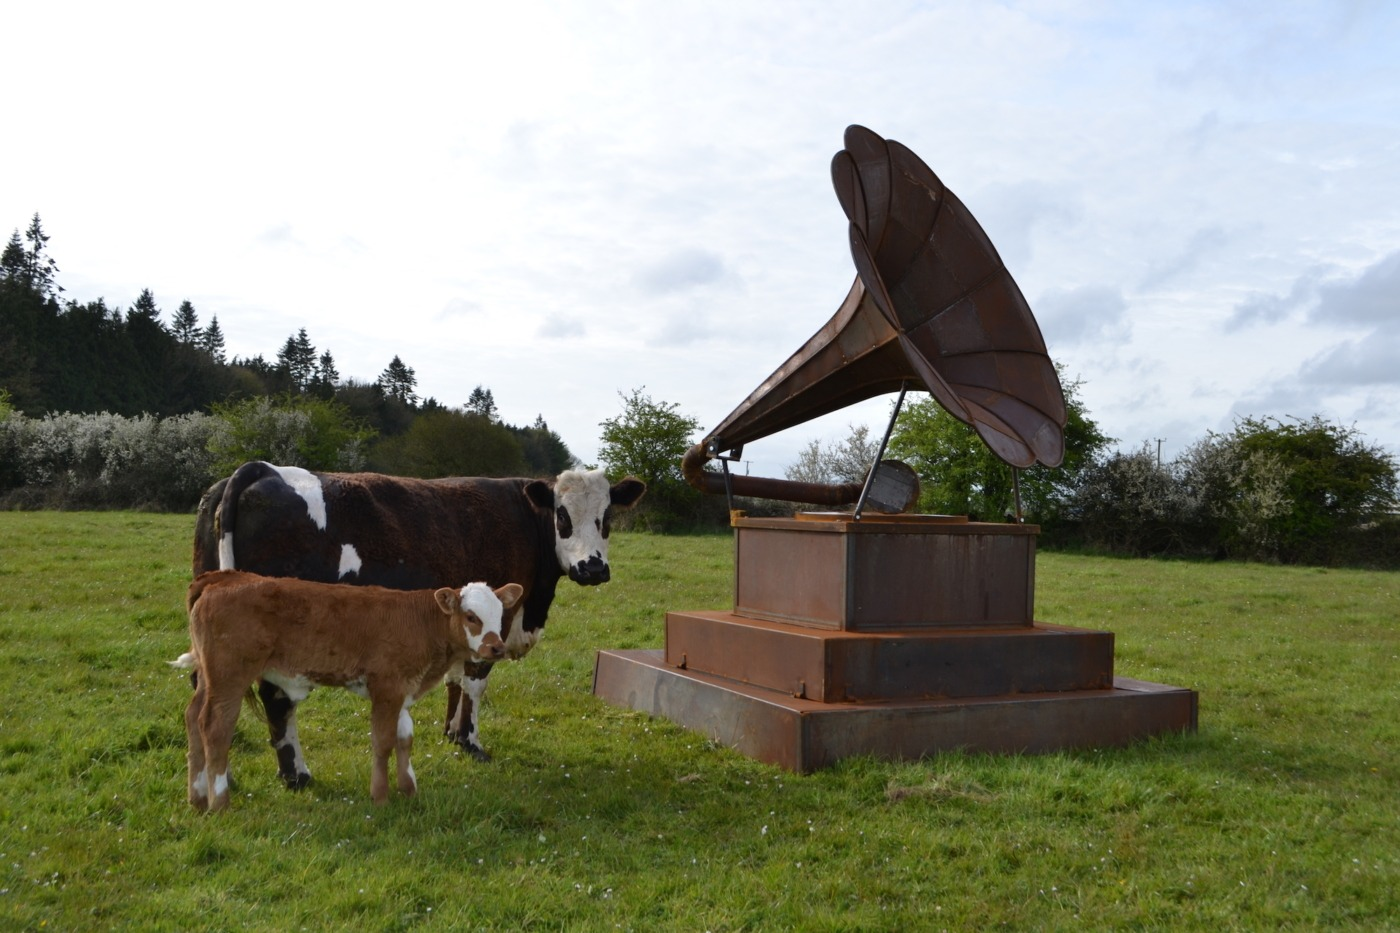 Kenilworth Arts Festival returns next week - The Boar